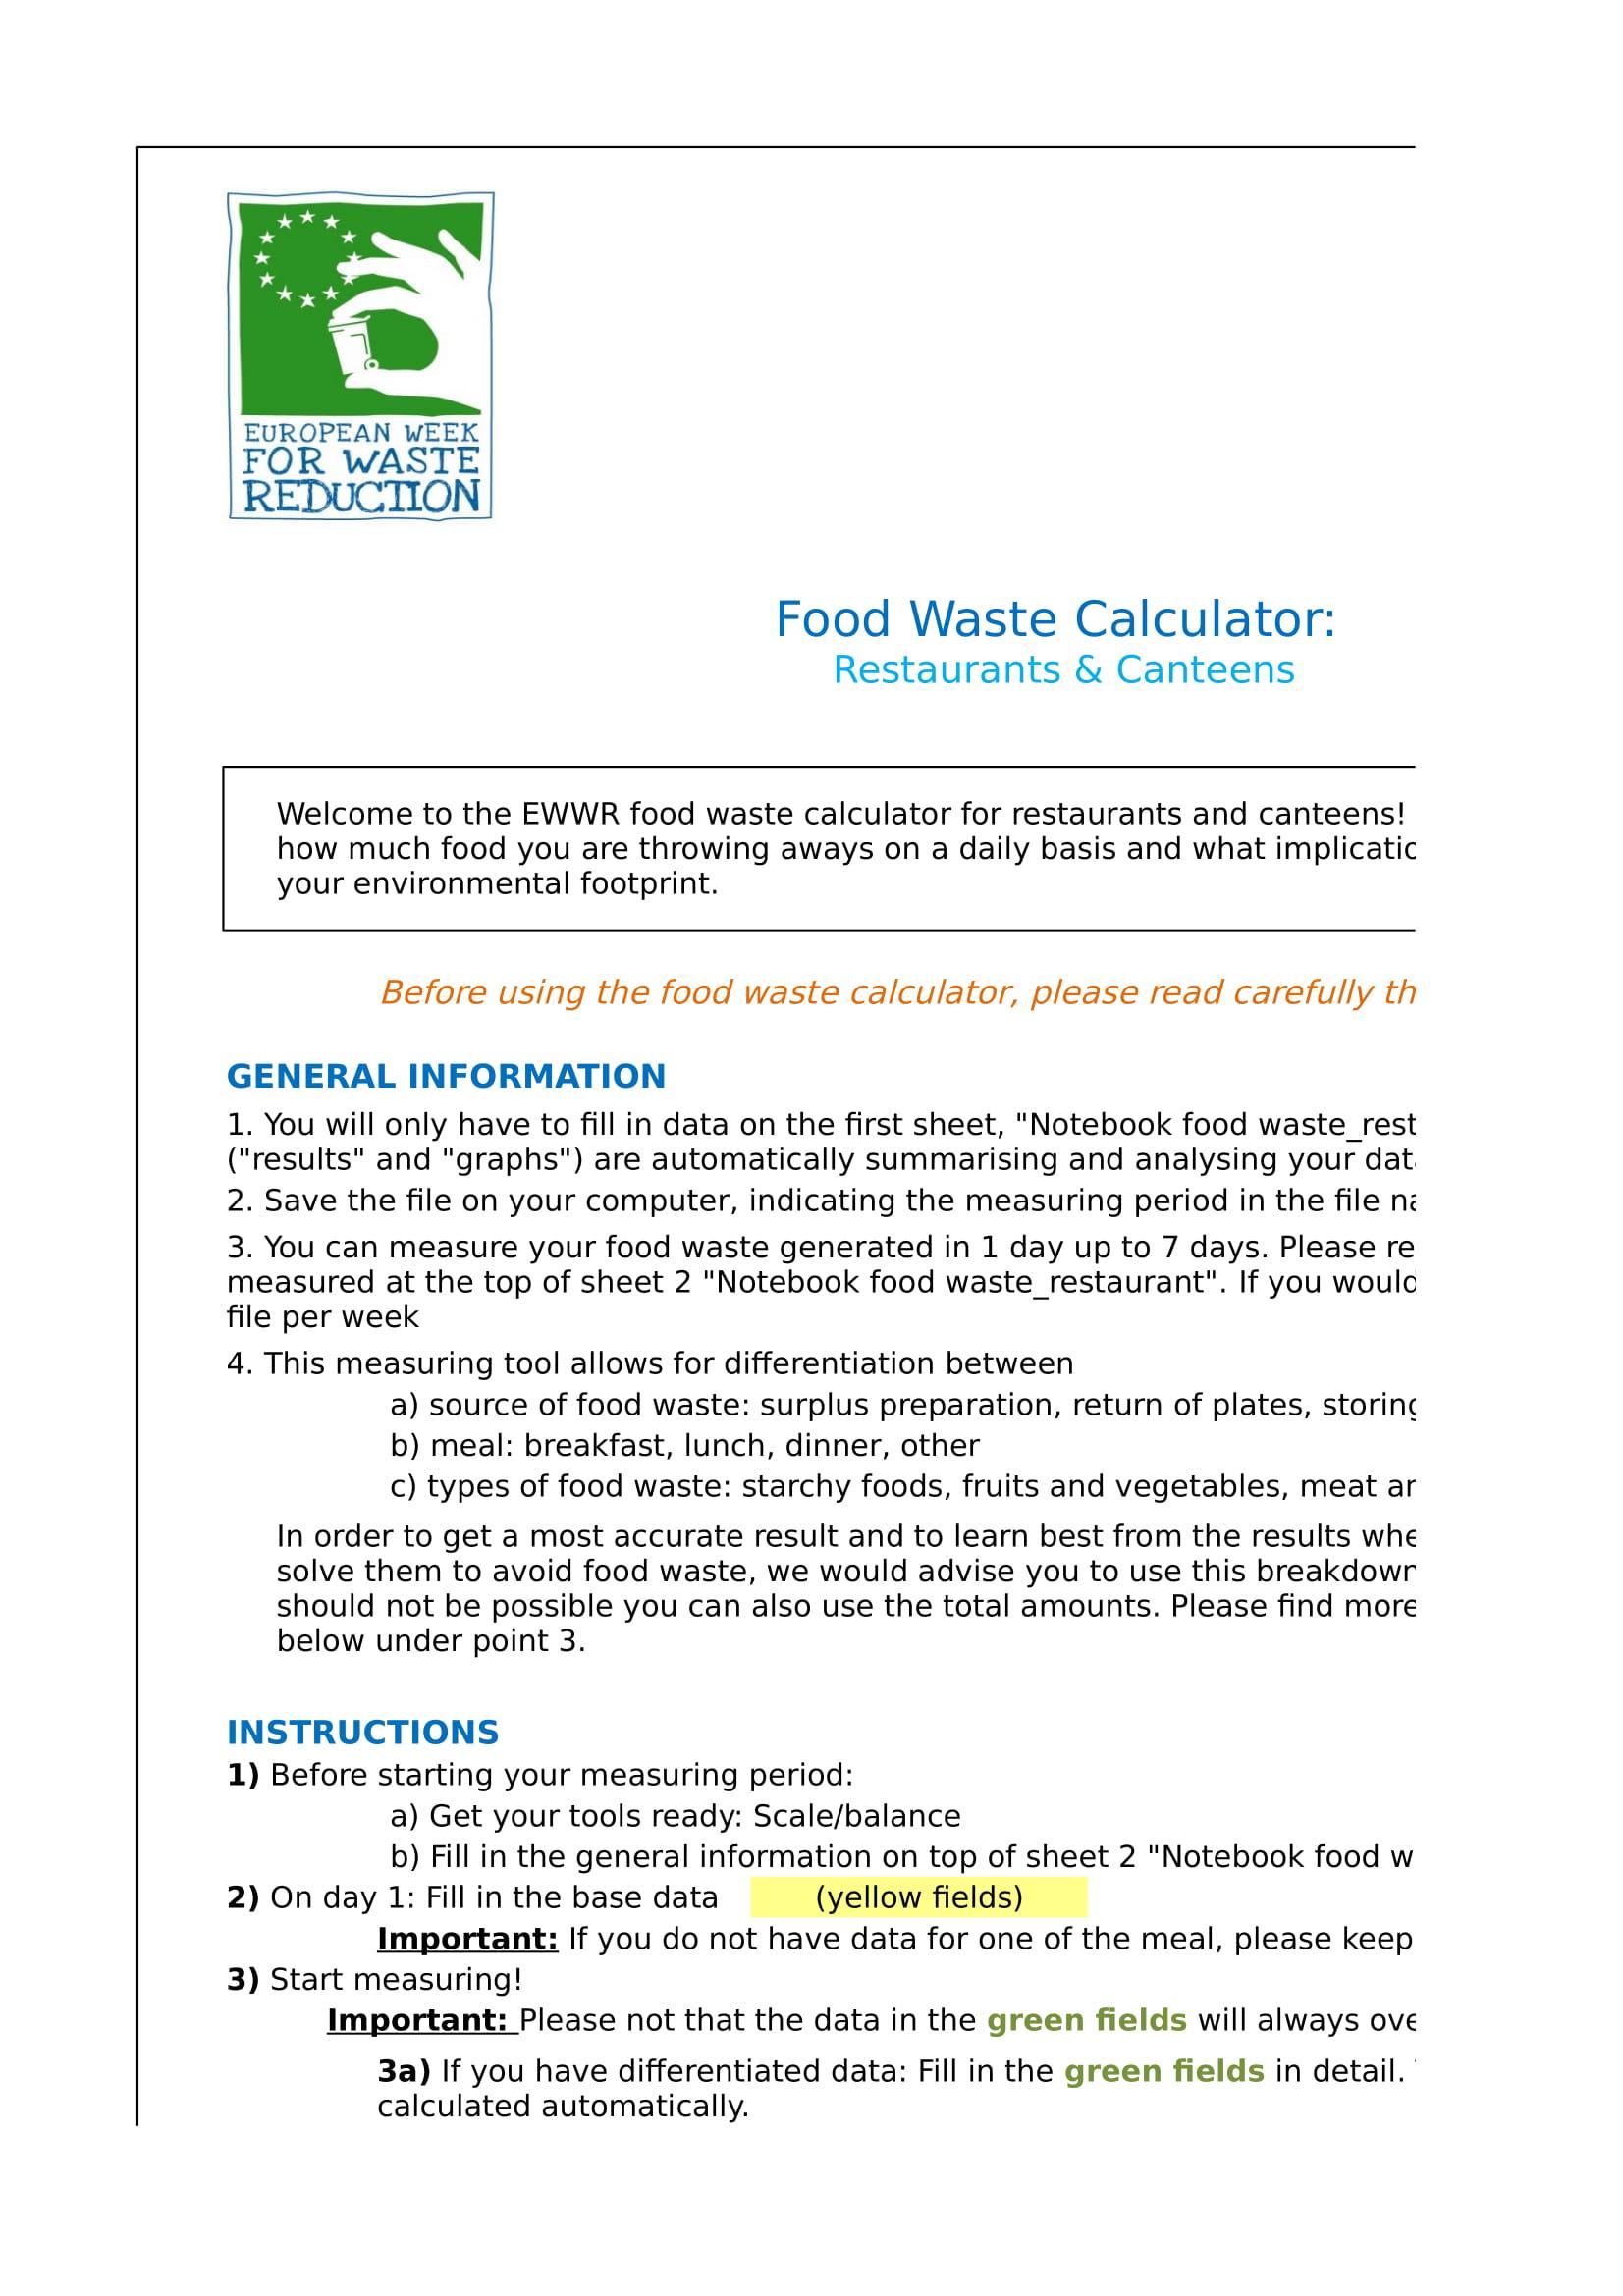 food waste calculator form 01